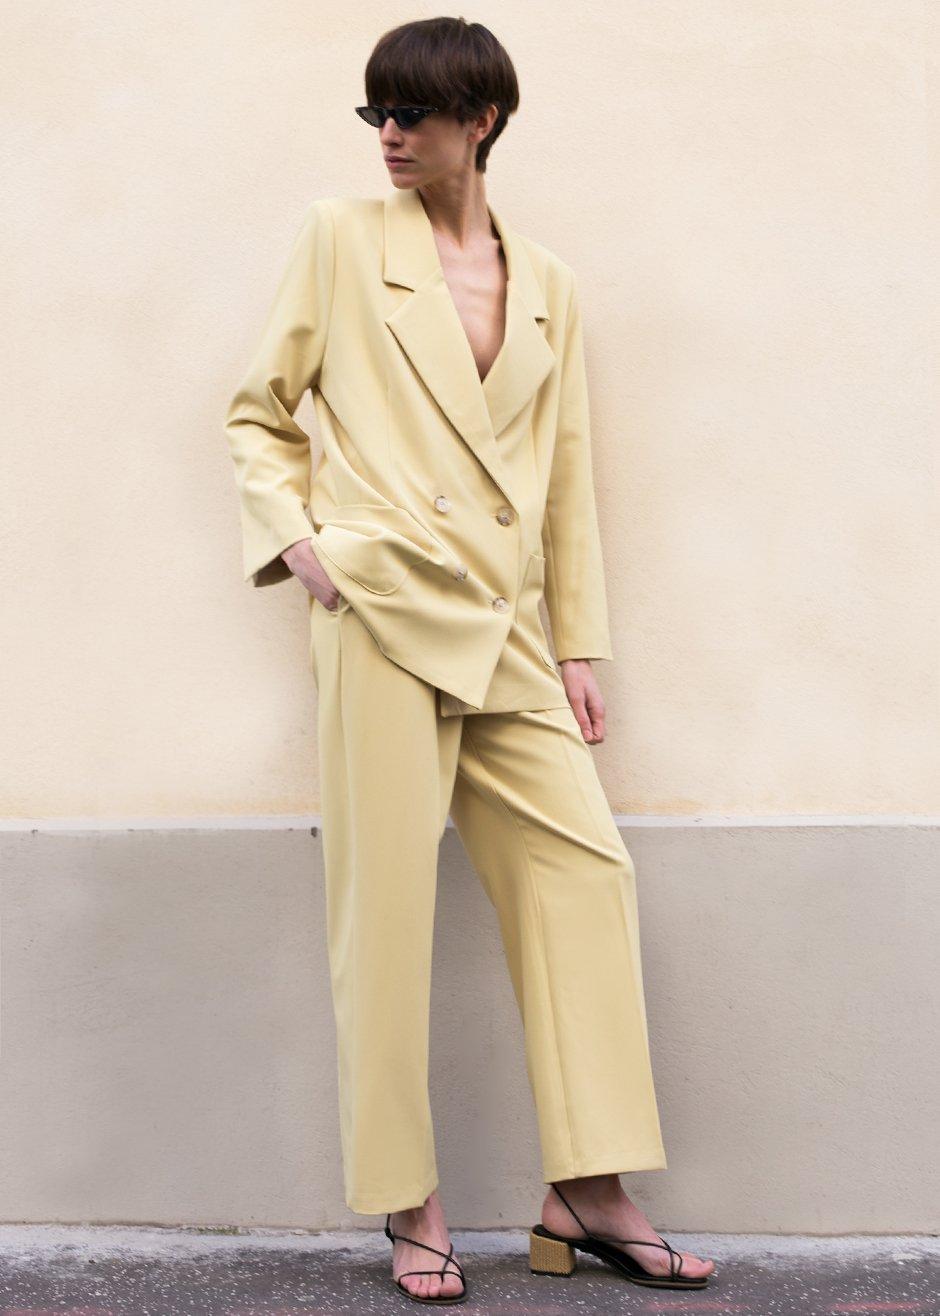 THE FRANKIE SHOP  //  Blazer  |  Pants